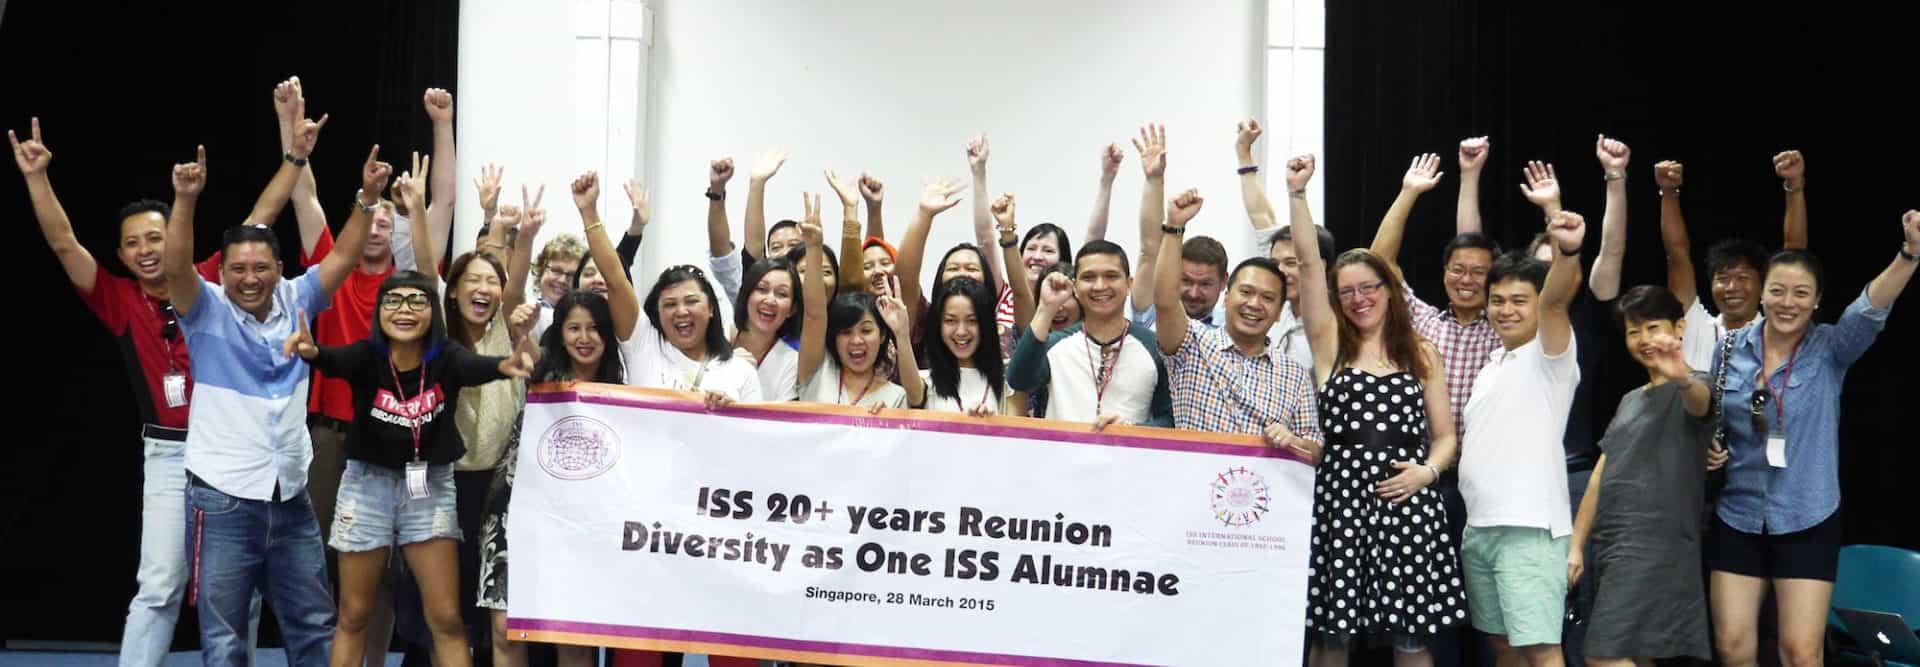 8j-alumni